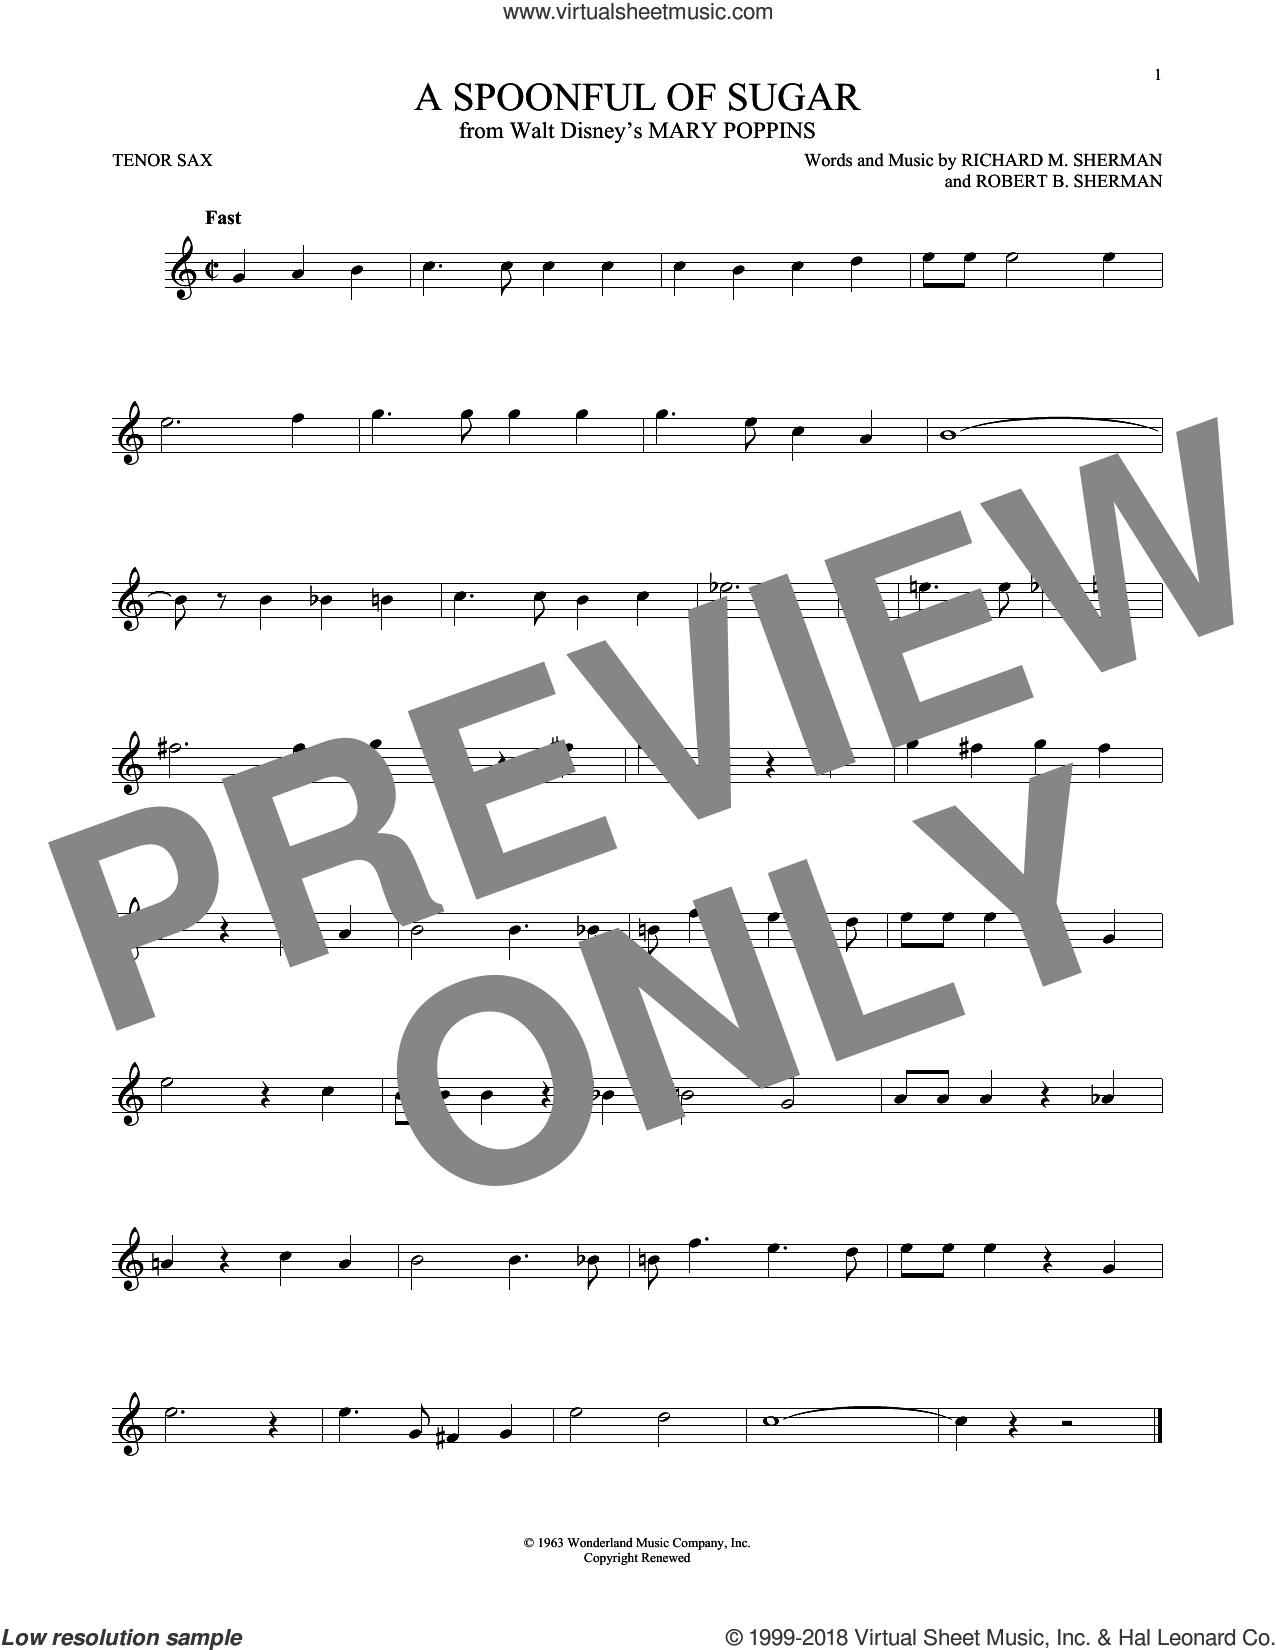 A Spoonful Of Sugar sheet music for tenor saxophone solo by Richard M. Sherman, Richard & Robert Sherman and Robert B. Sherman, intermediate skill level